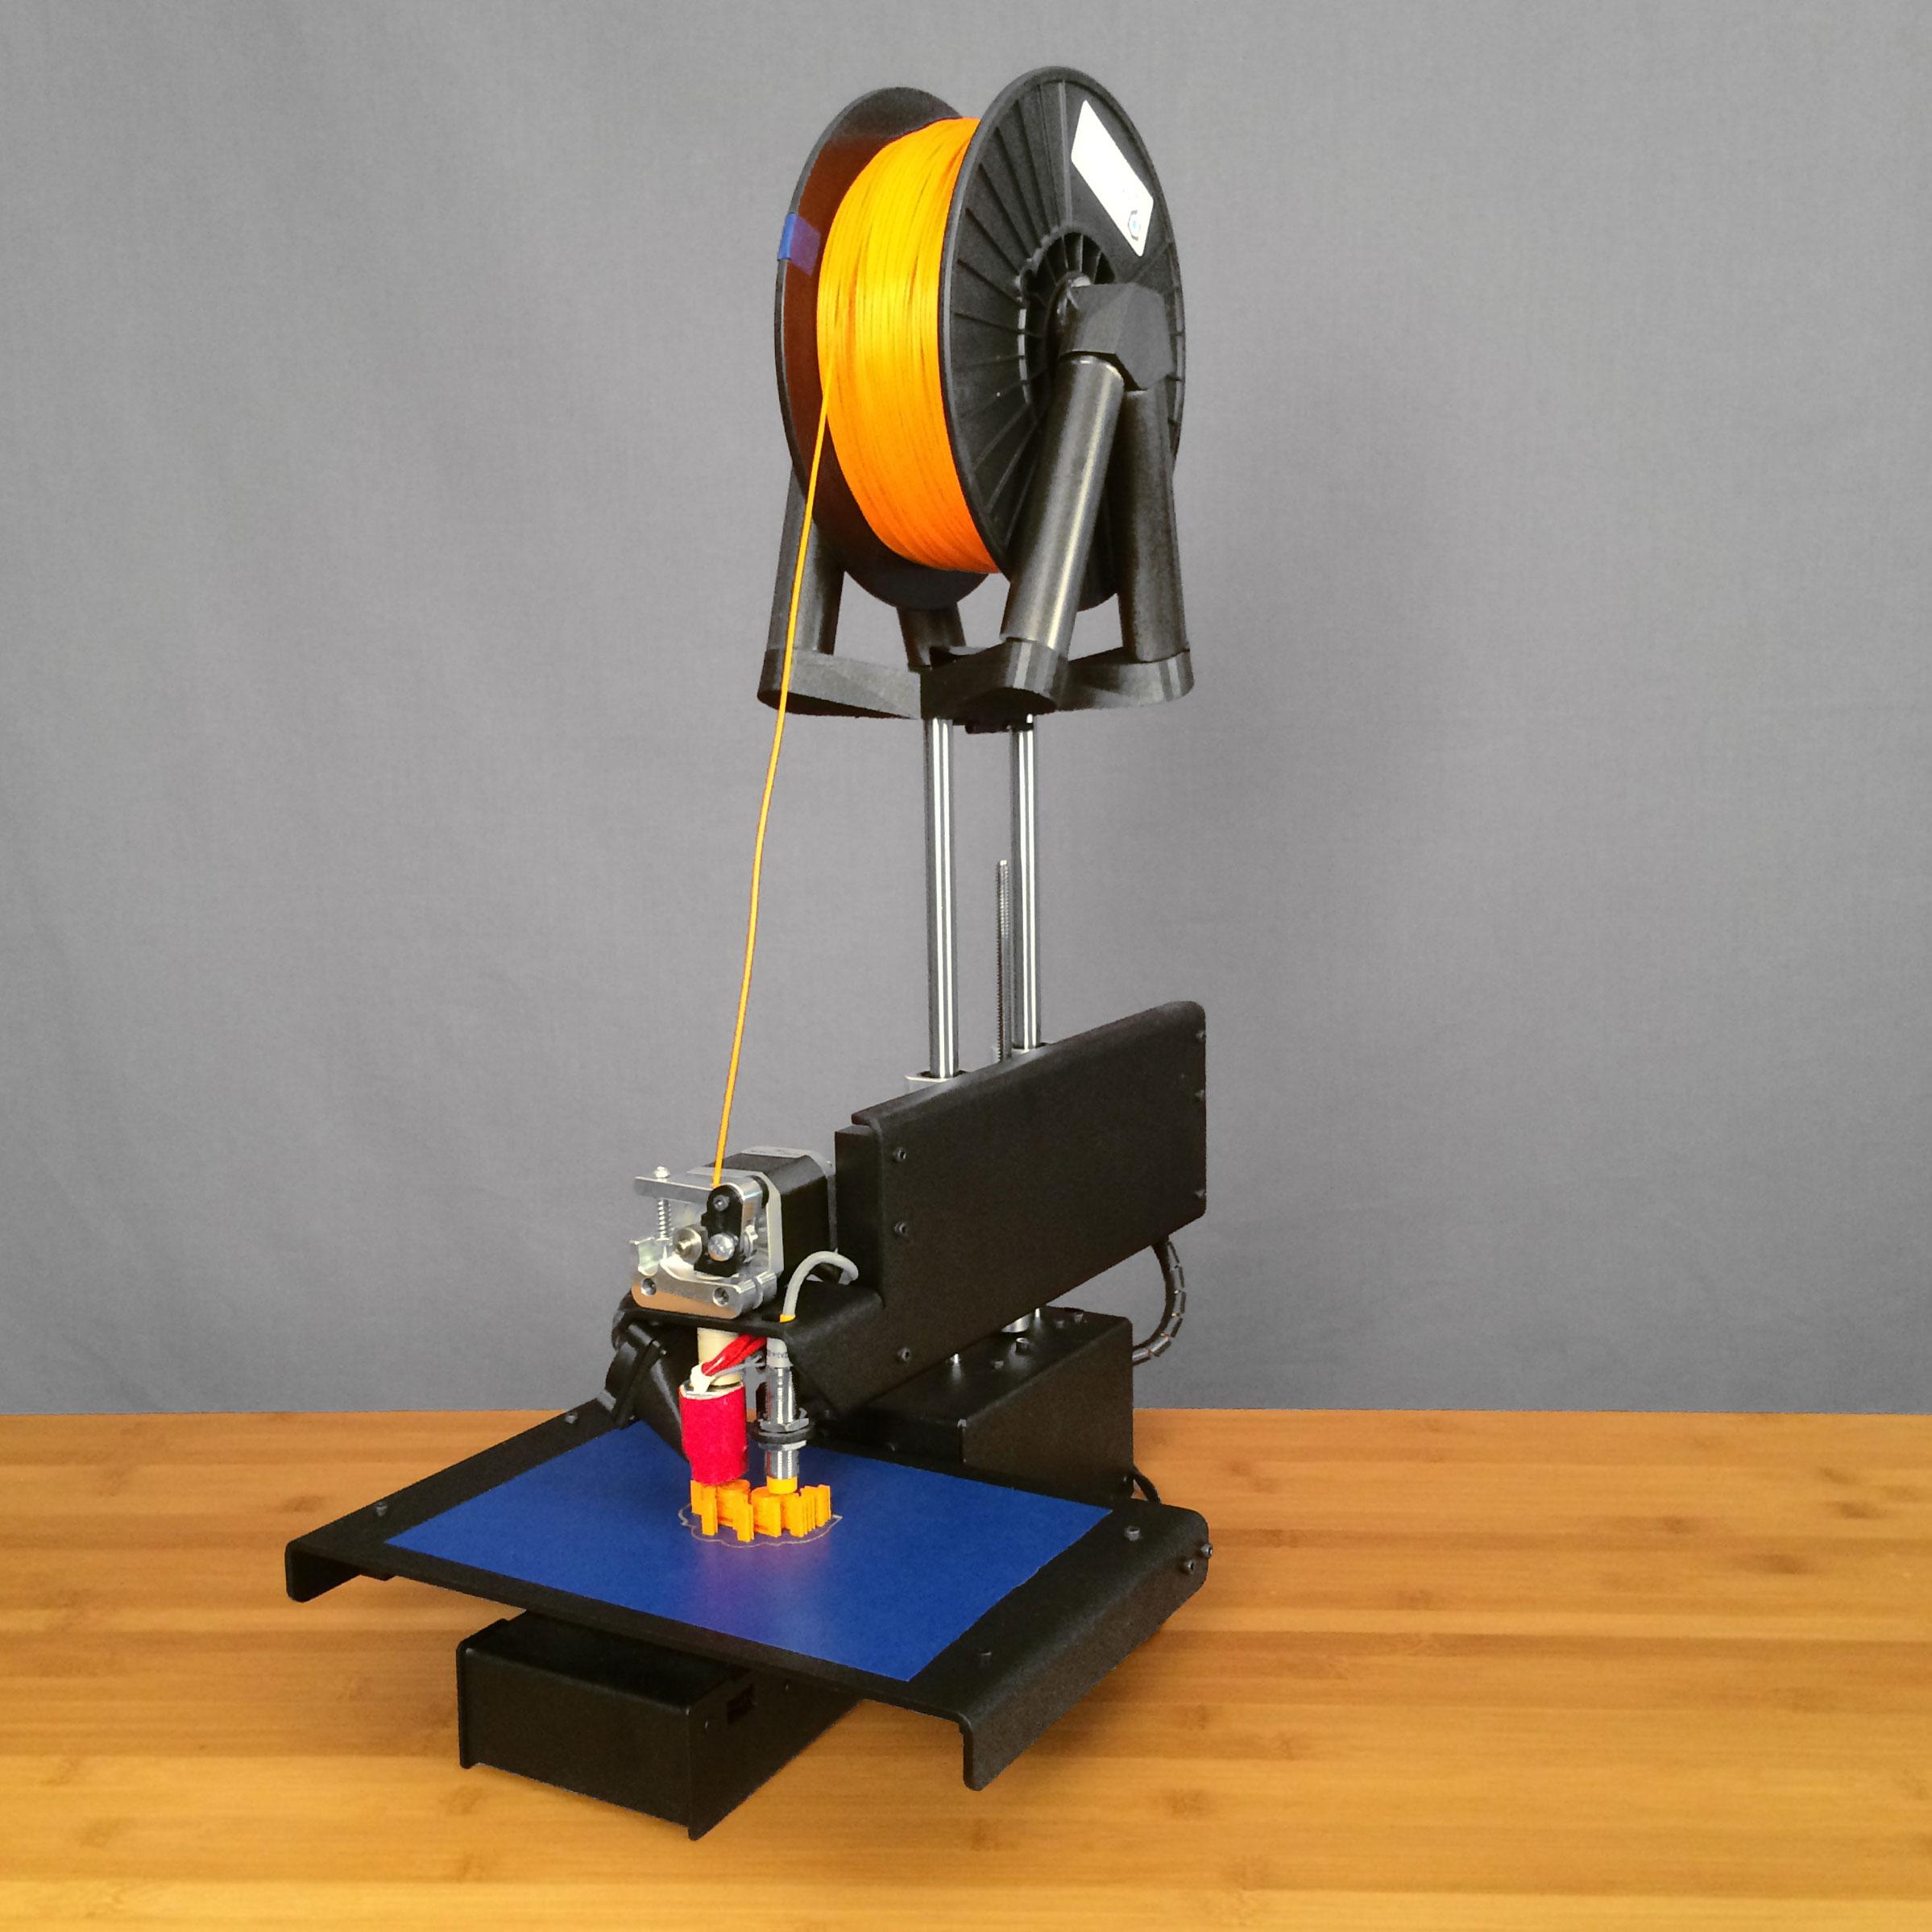 stl show tell printrbot simple metal spool holder 3dprinting